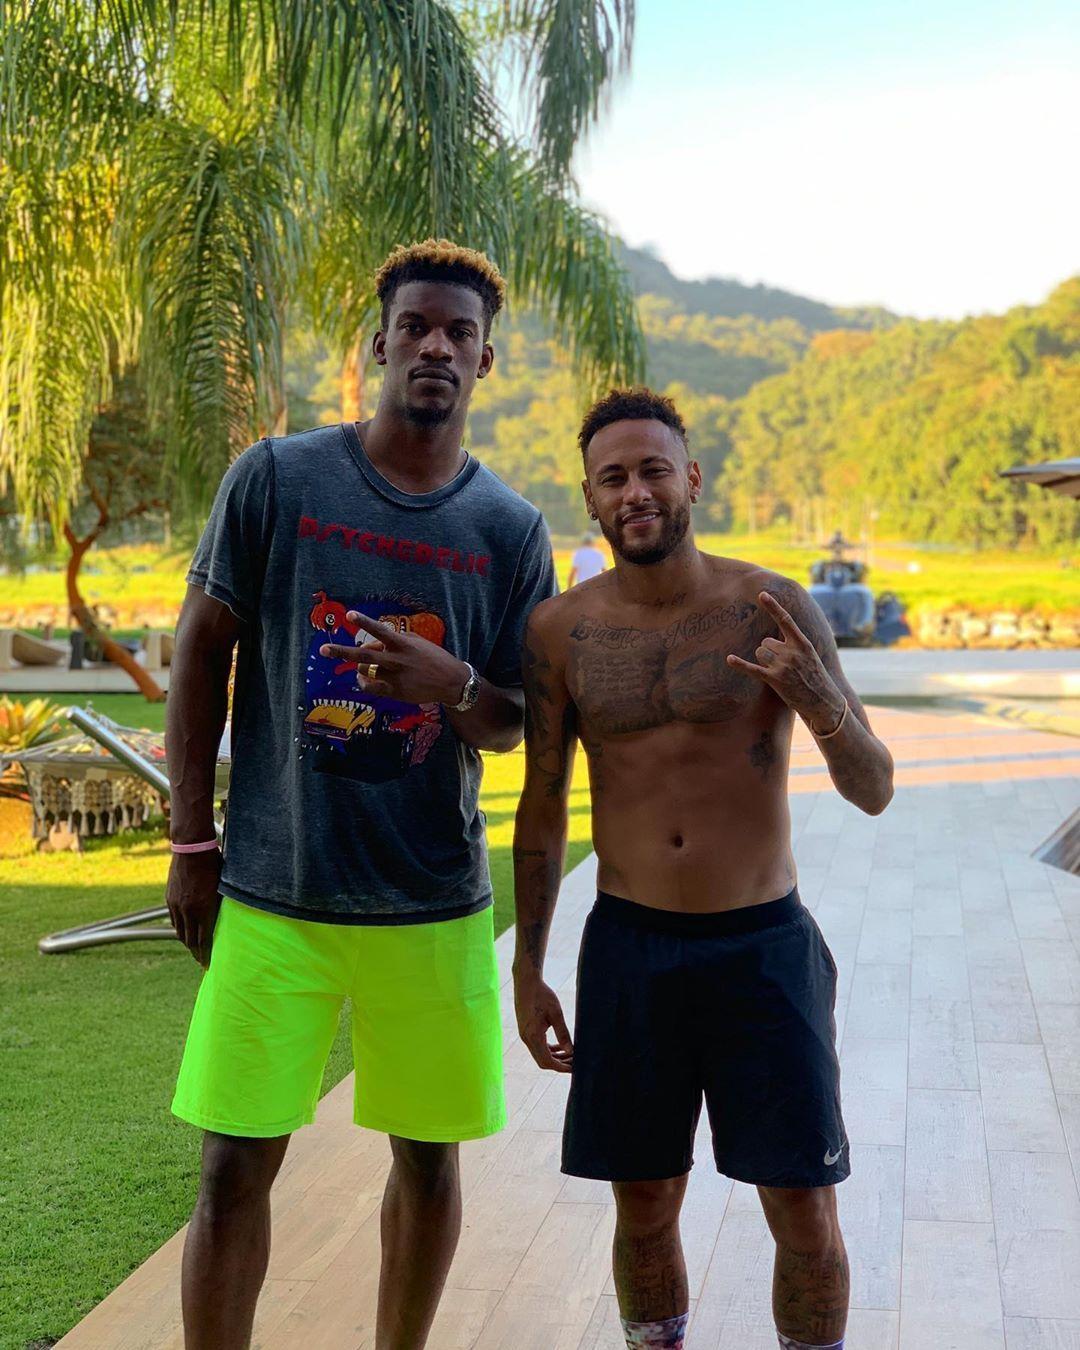 Pin by Bryanna🦋 on Neymar Jr ️ Neymar, Nba stars, Neymar jr